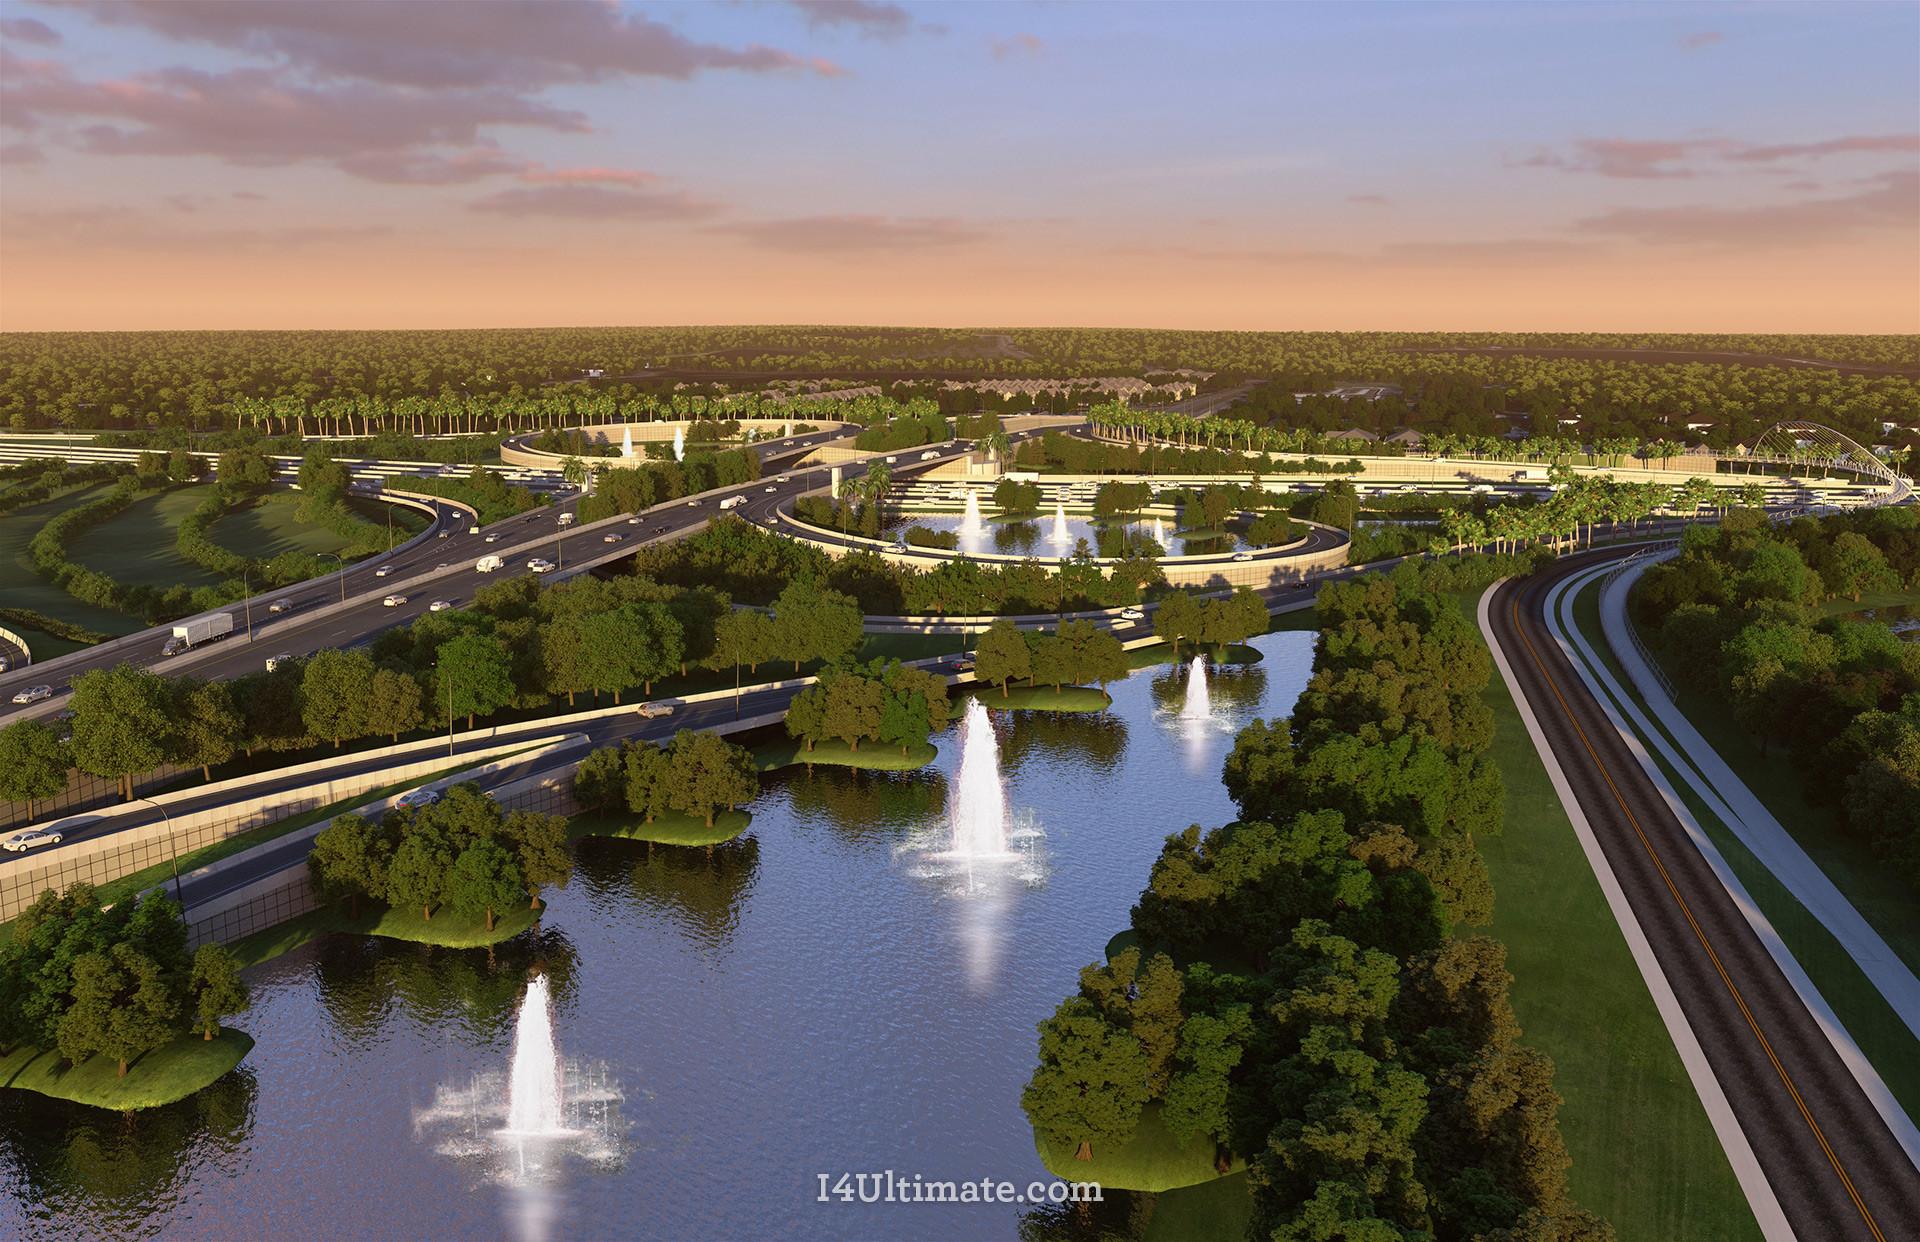 Orlando & Central Florida Traffic - Orlando Sentinel